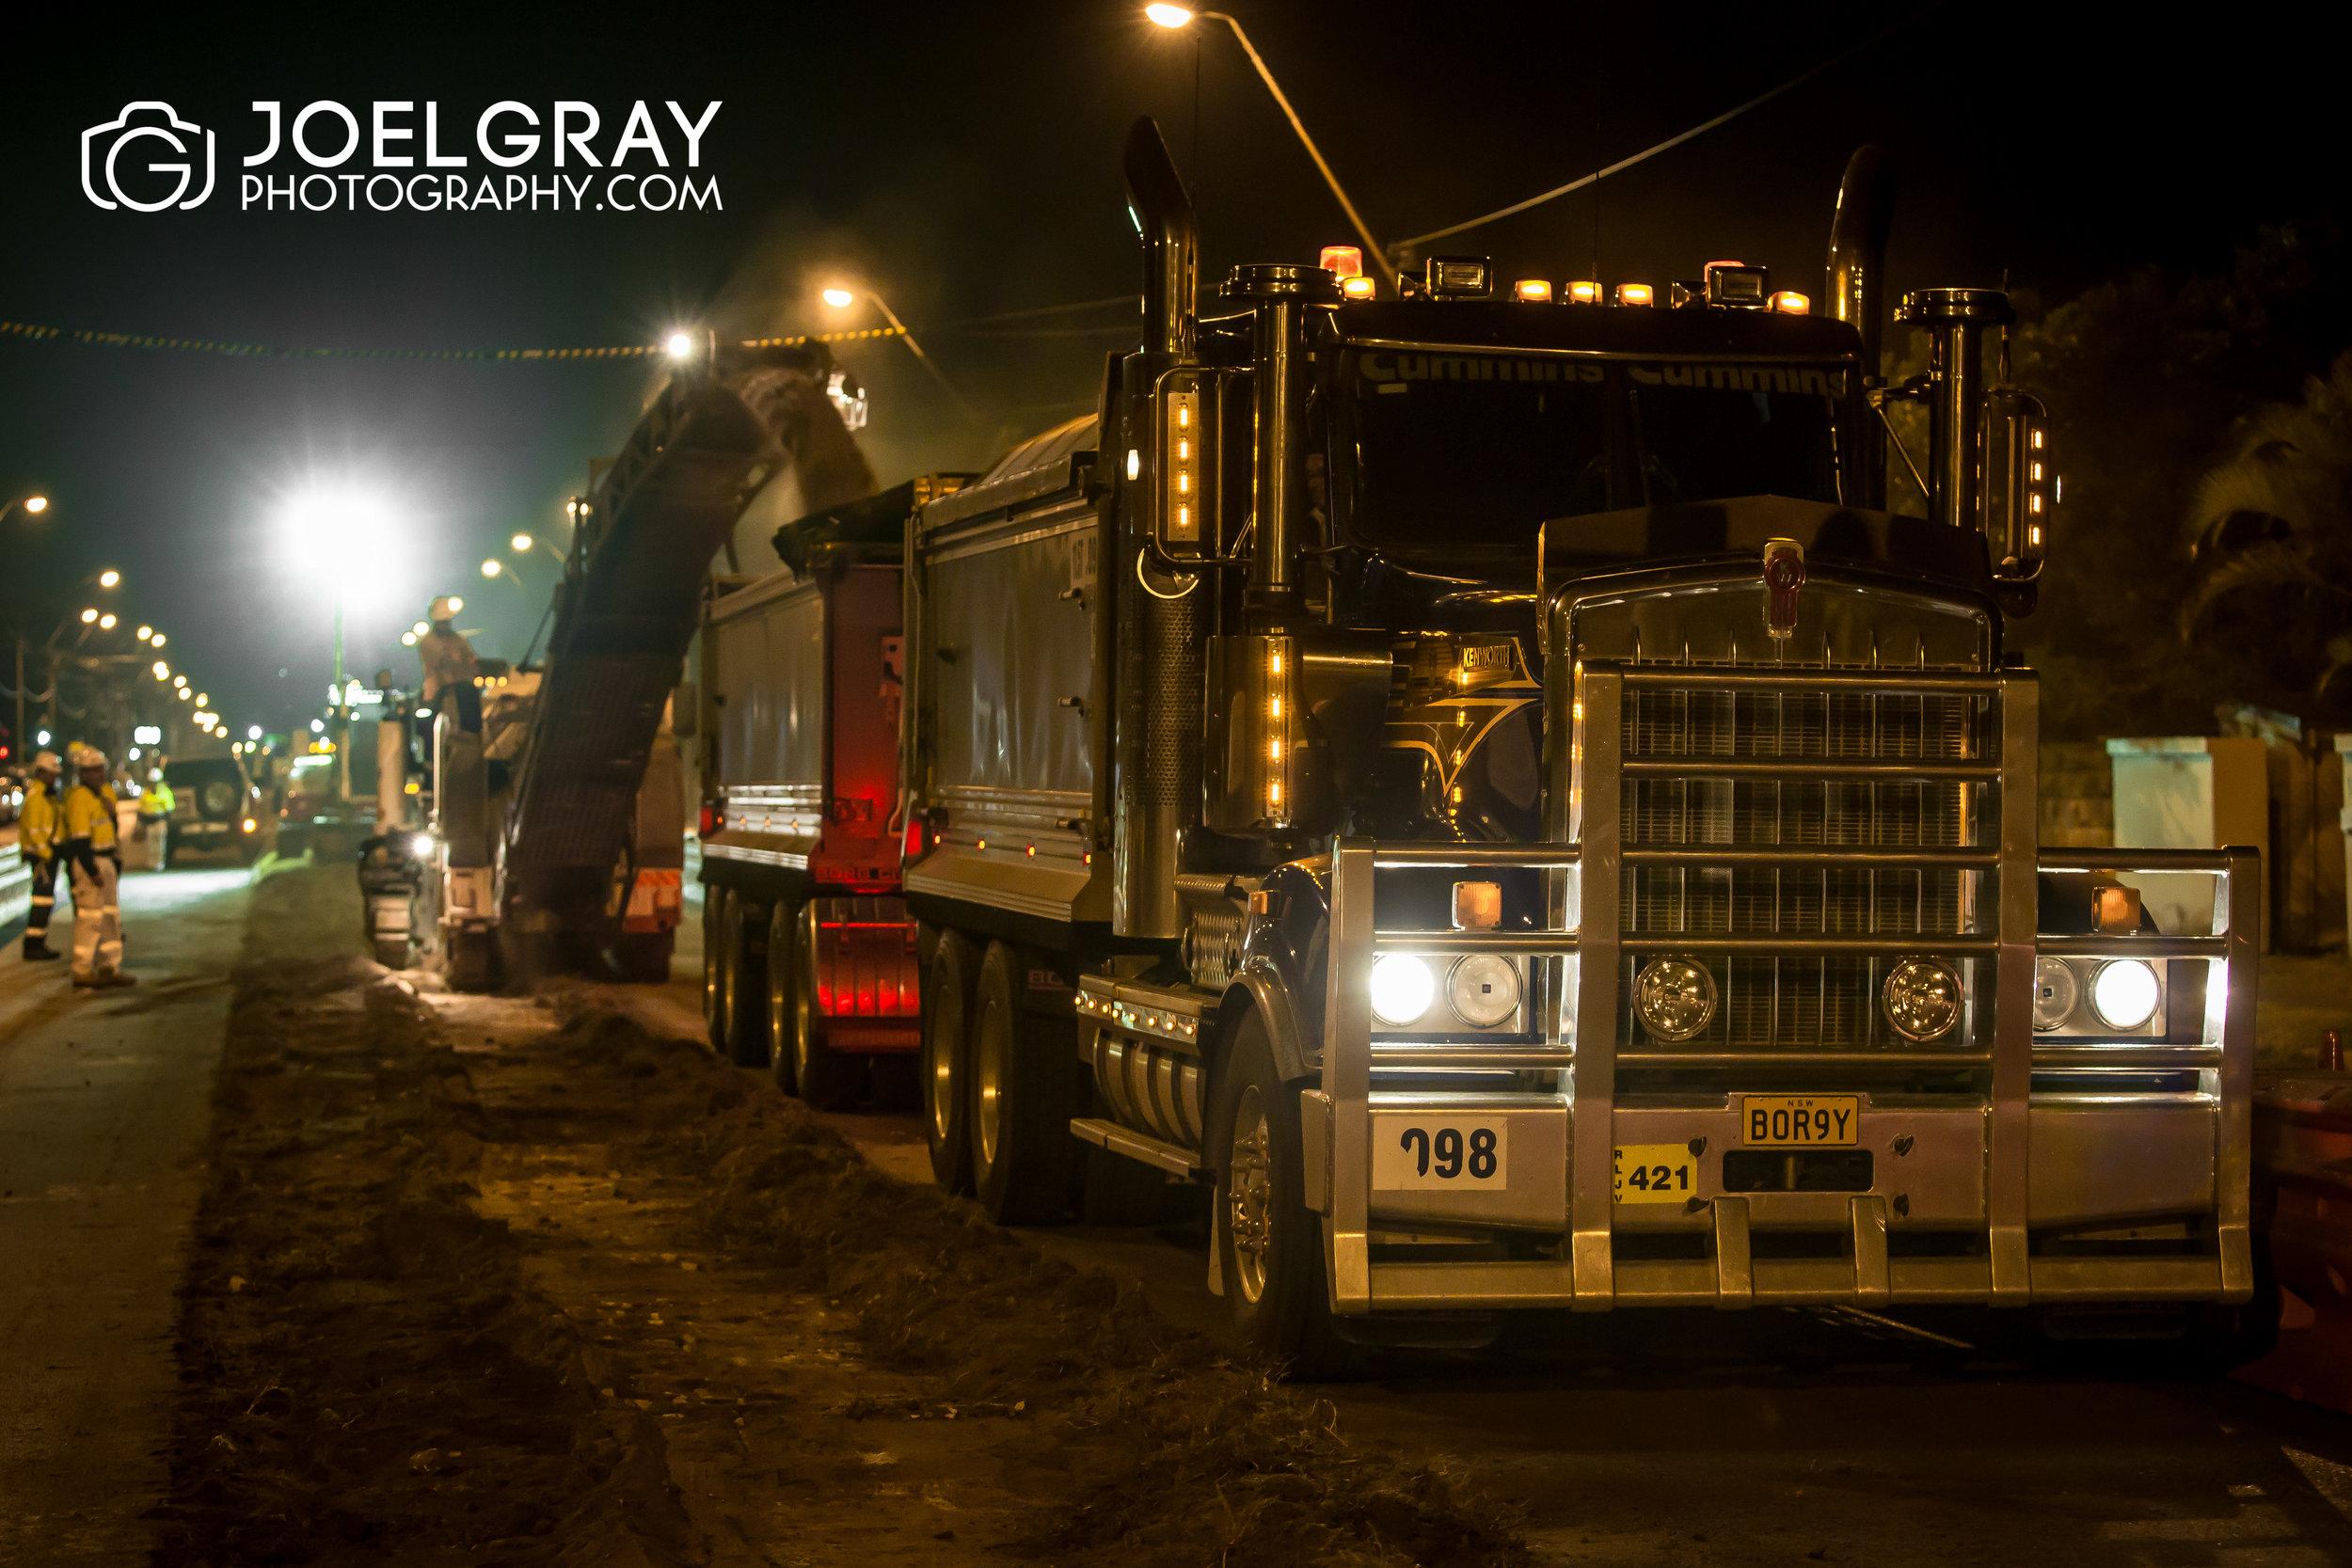 sydney-onsite-business-construction-photographer-1800829994